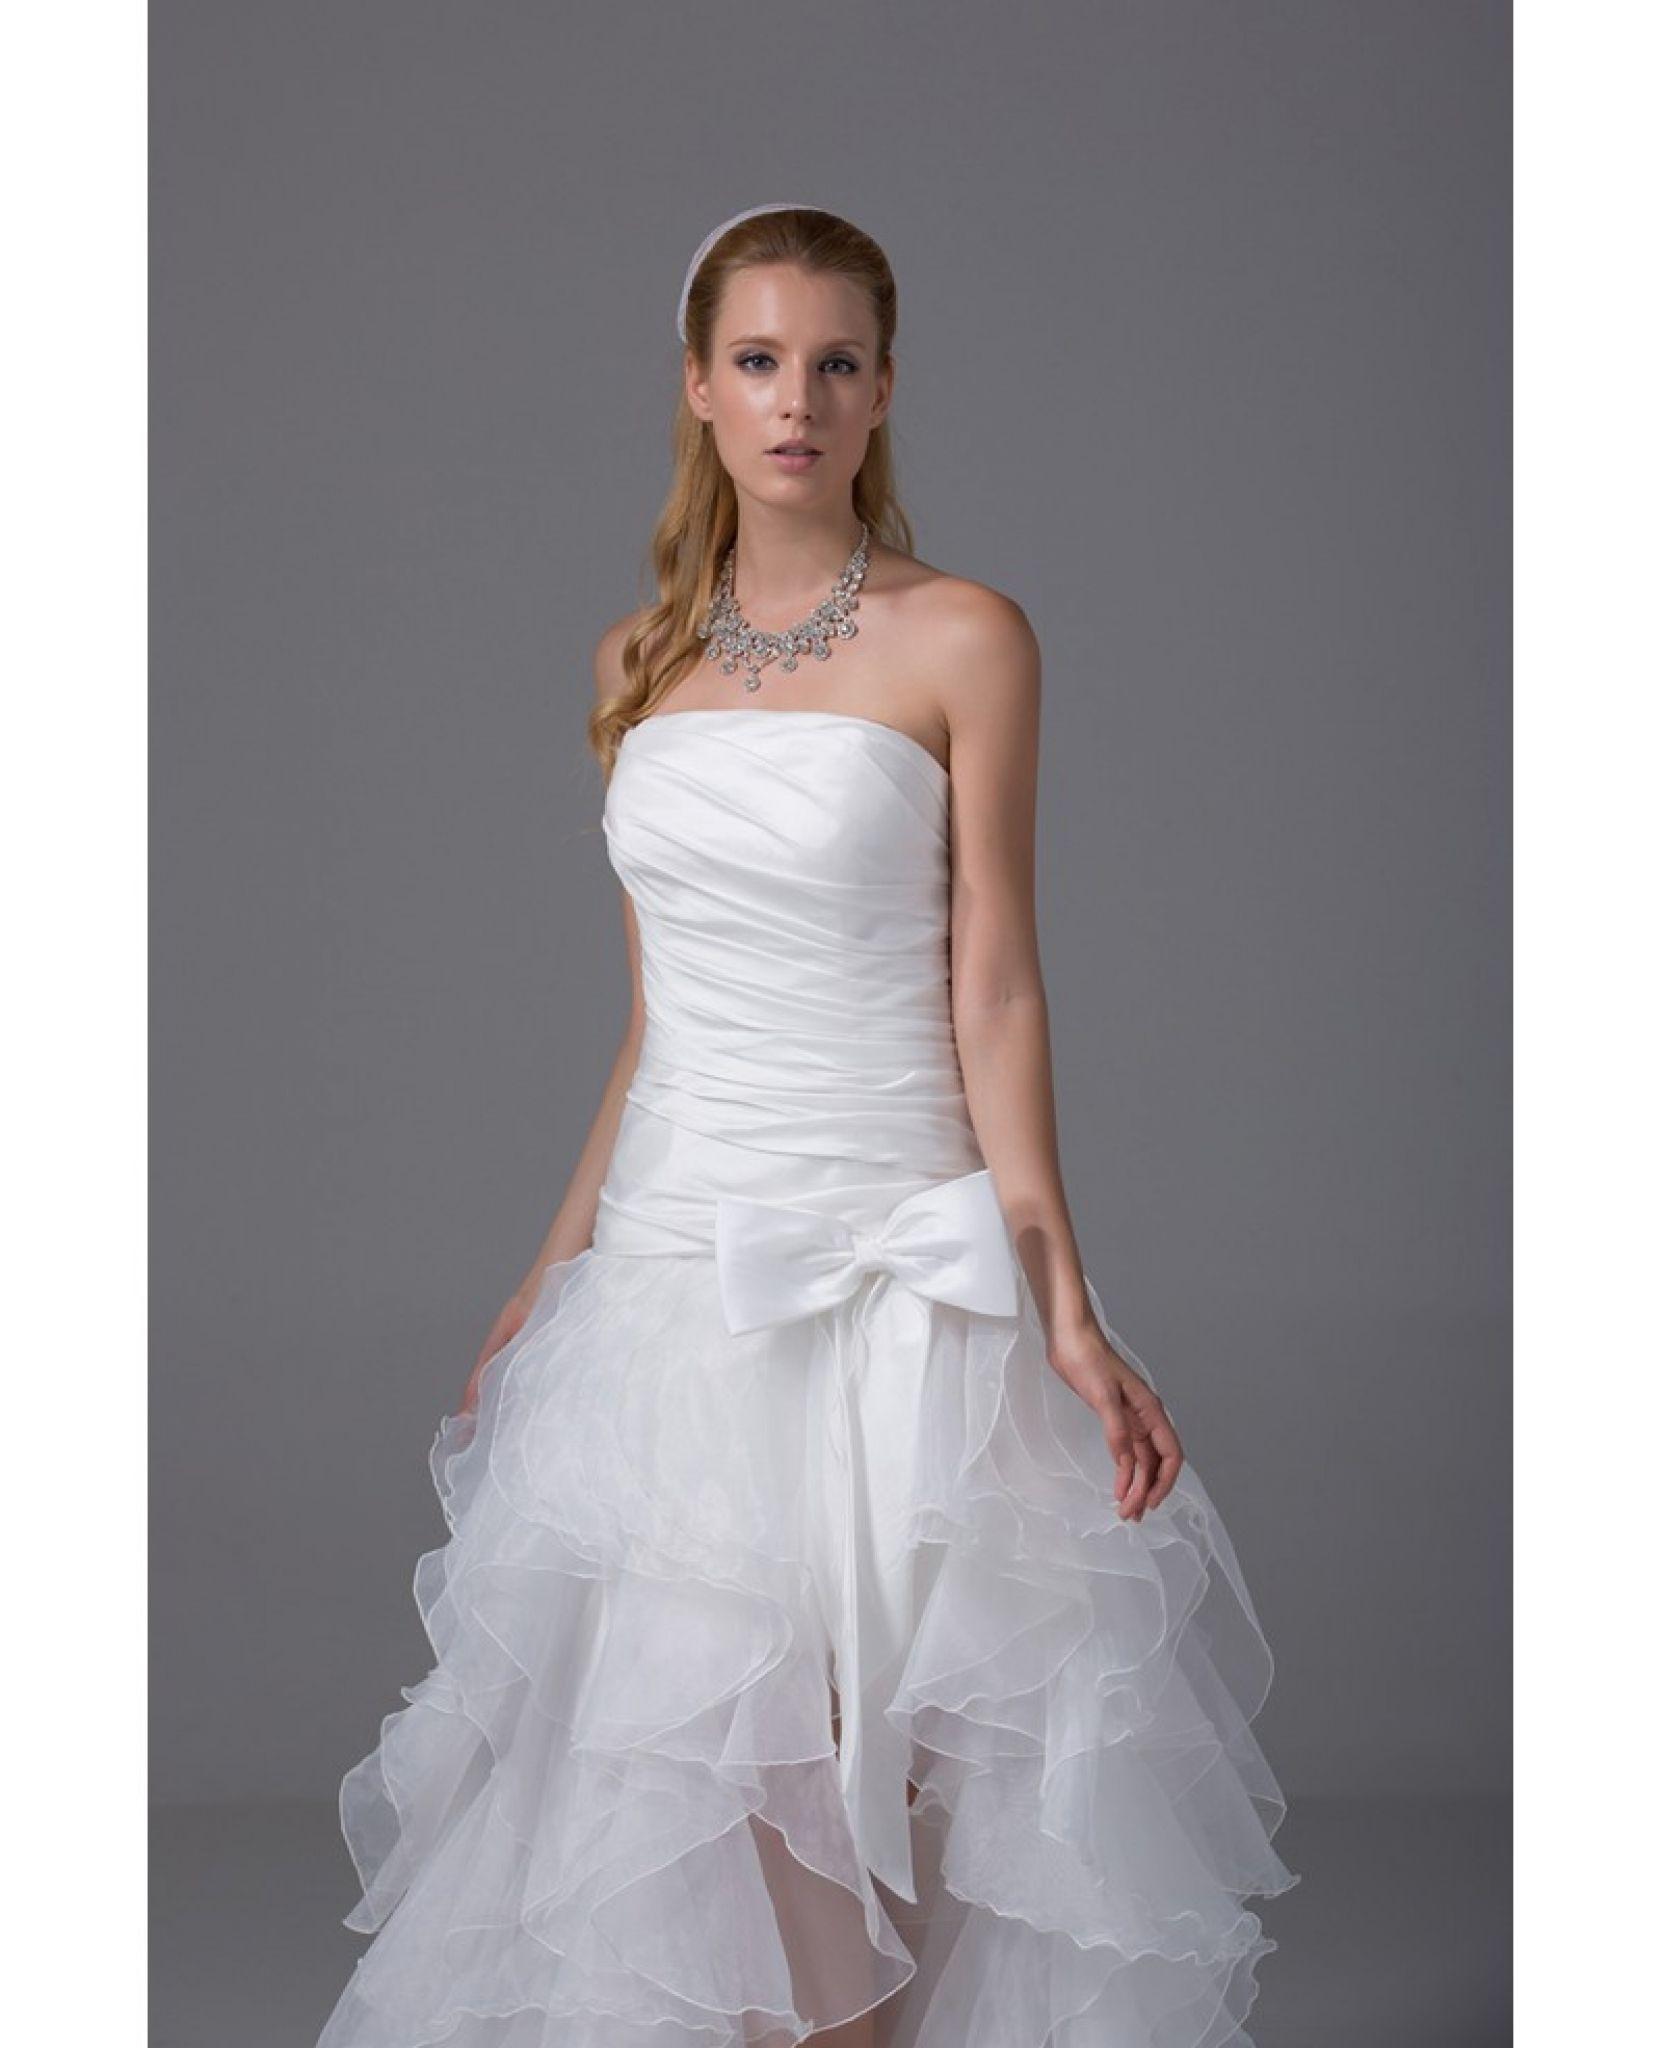 Cute short wedding dresses  cute short wedding dresses  wedding dresses for cheap Check more at